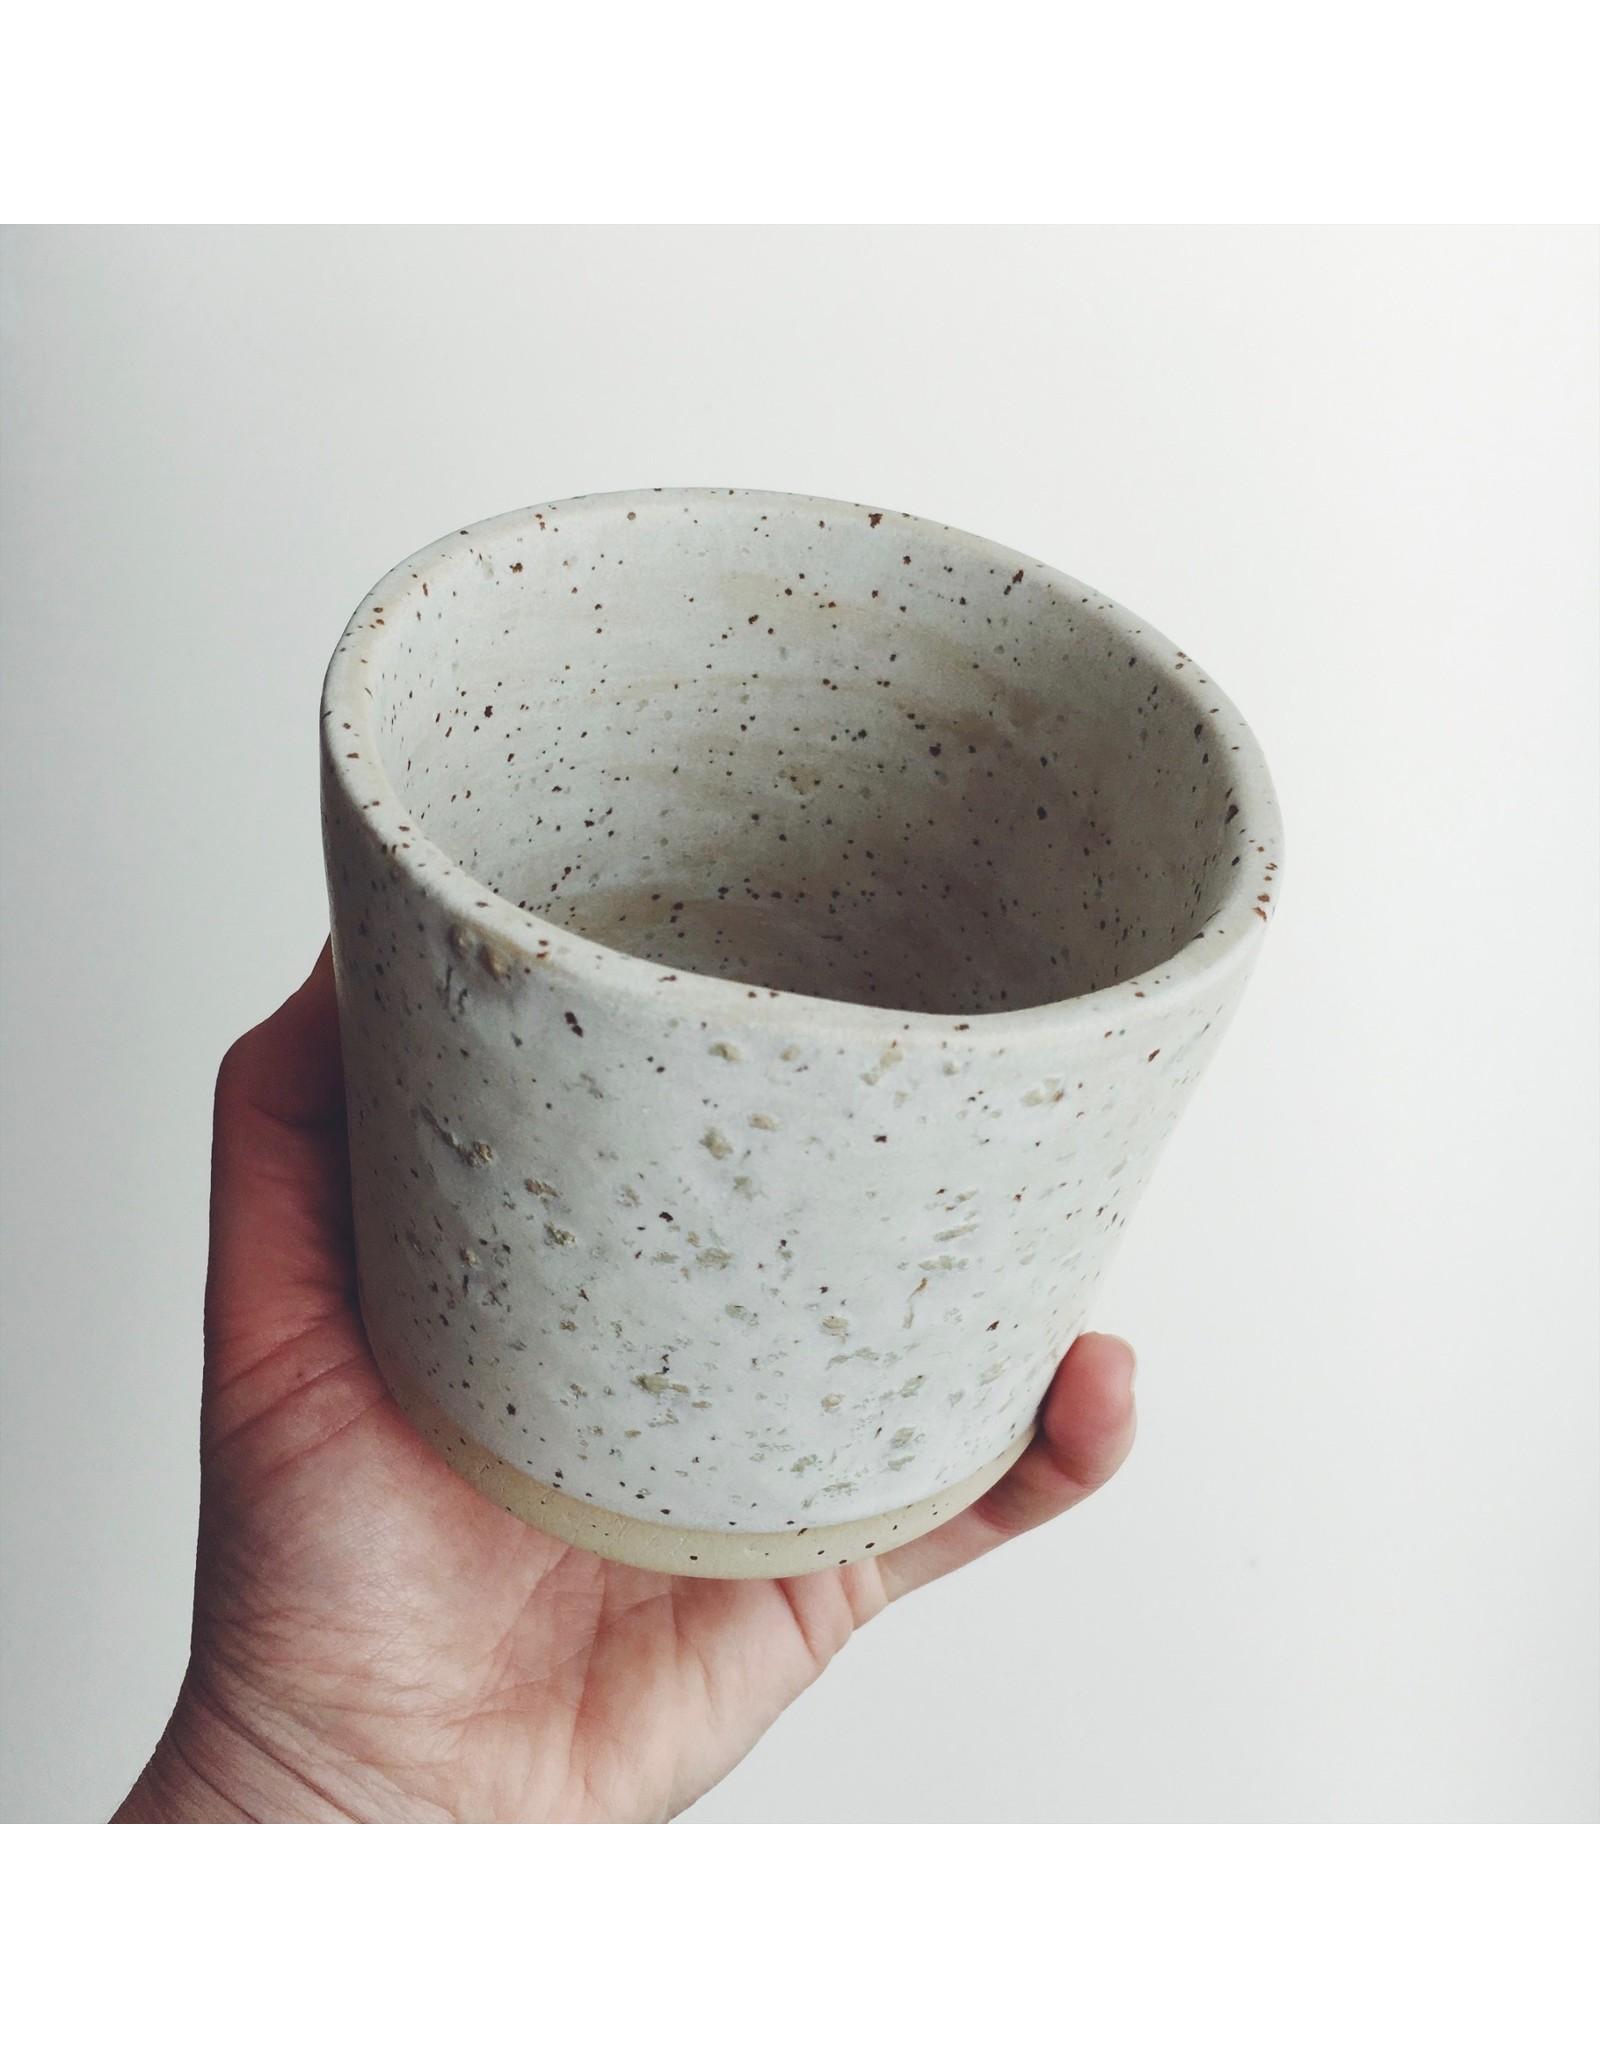 Handmade Stoneware Planter